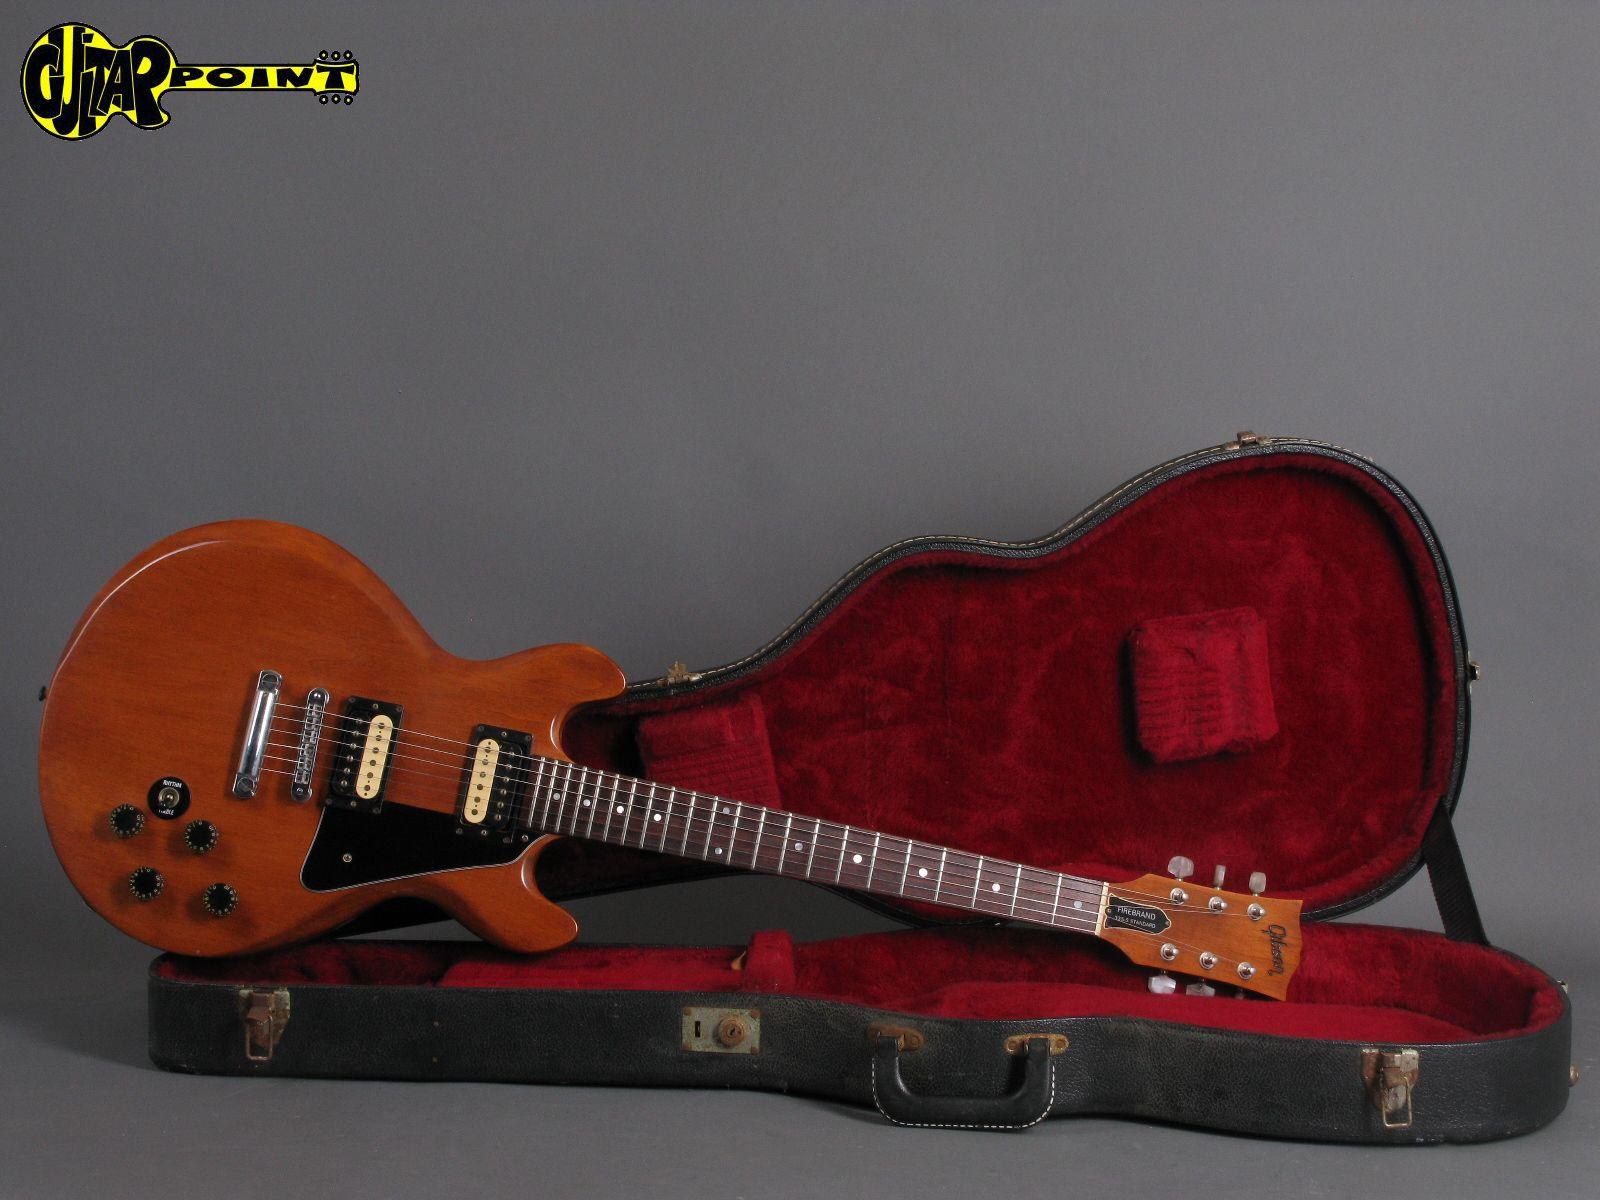 gibson es335 s firebrand 1980 natural guitar for sale guitarpoint. Black Bedroom Furniture Sets. Home Design Ideas